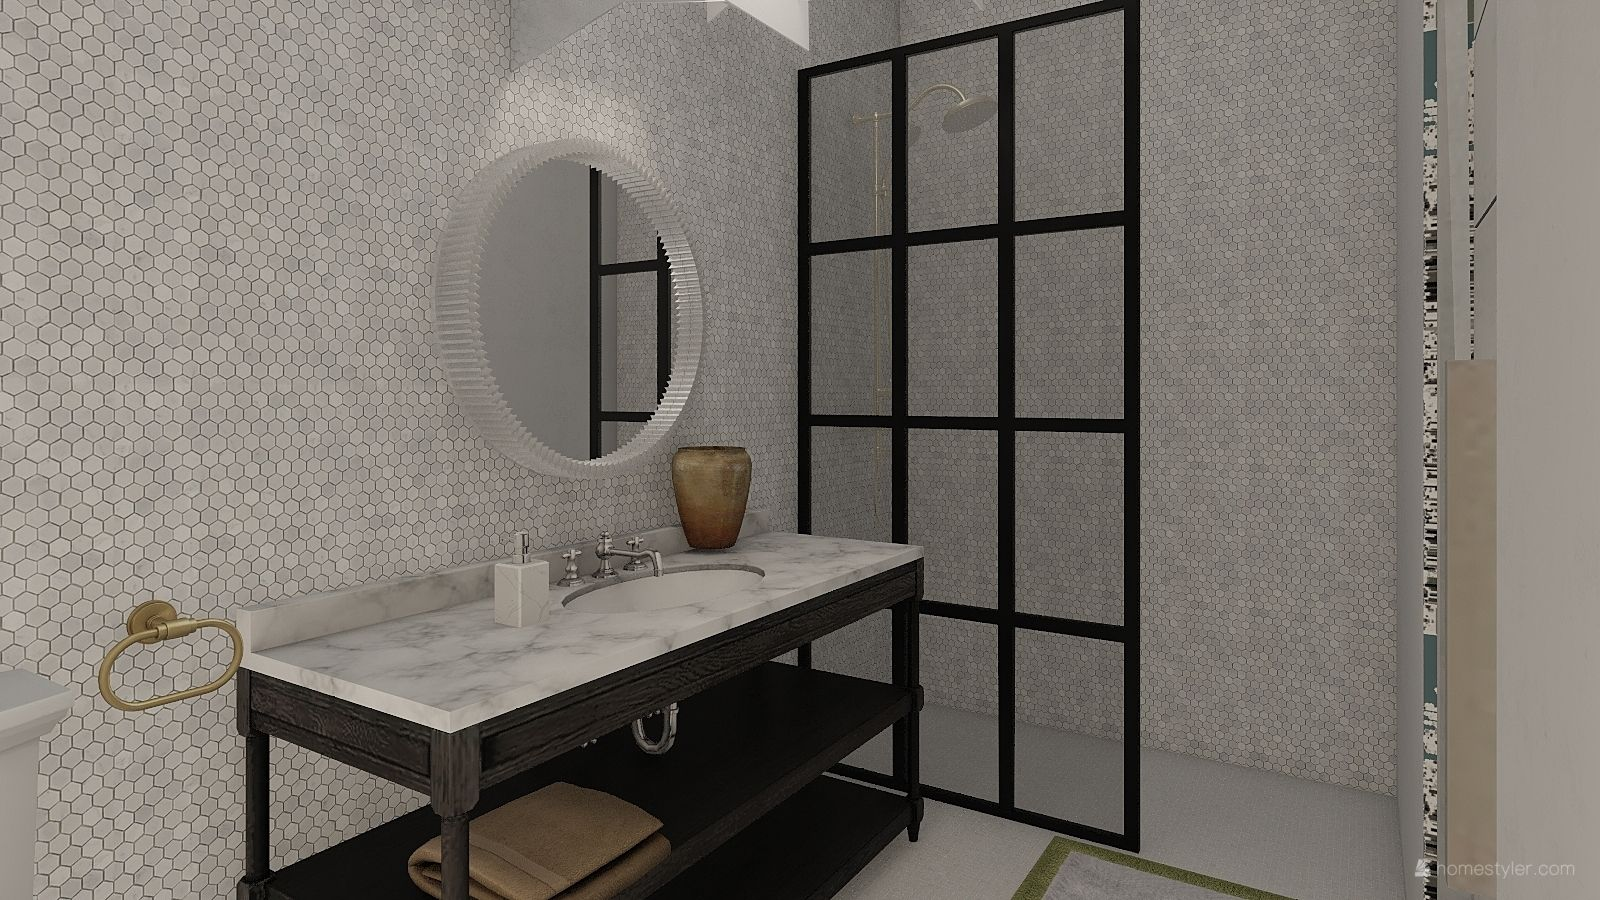 Homestyler design | Interior design tools, 3d home design ...